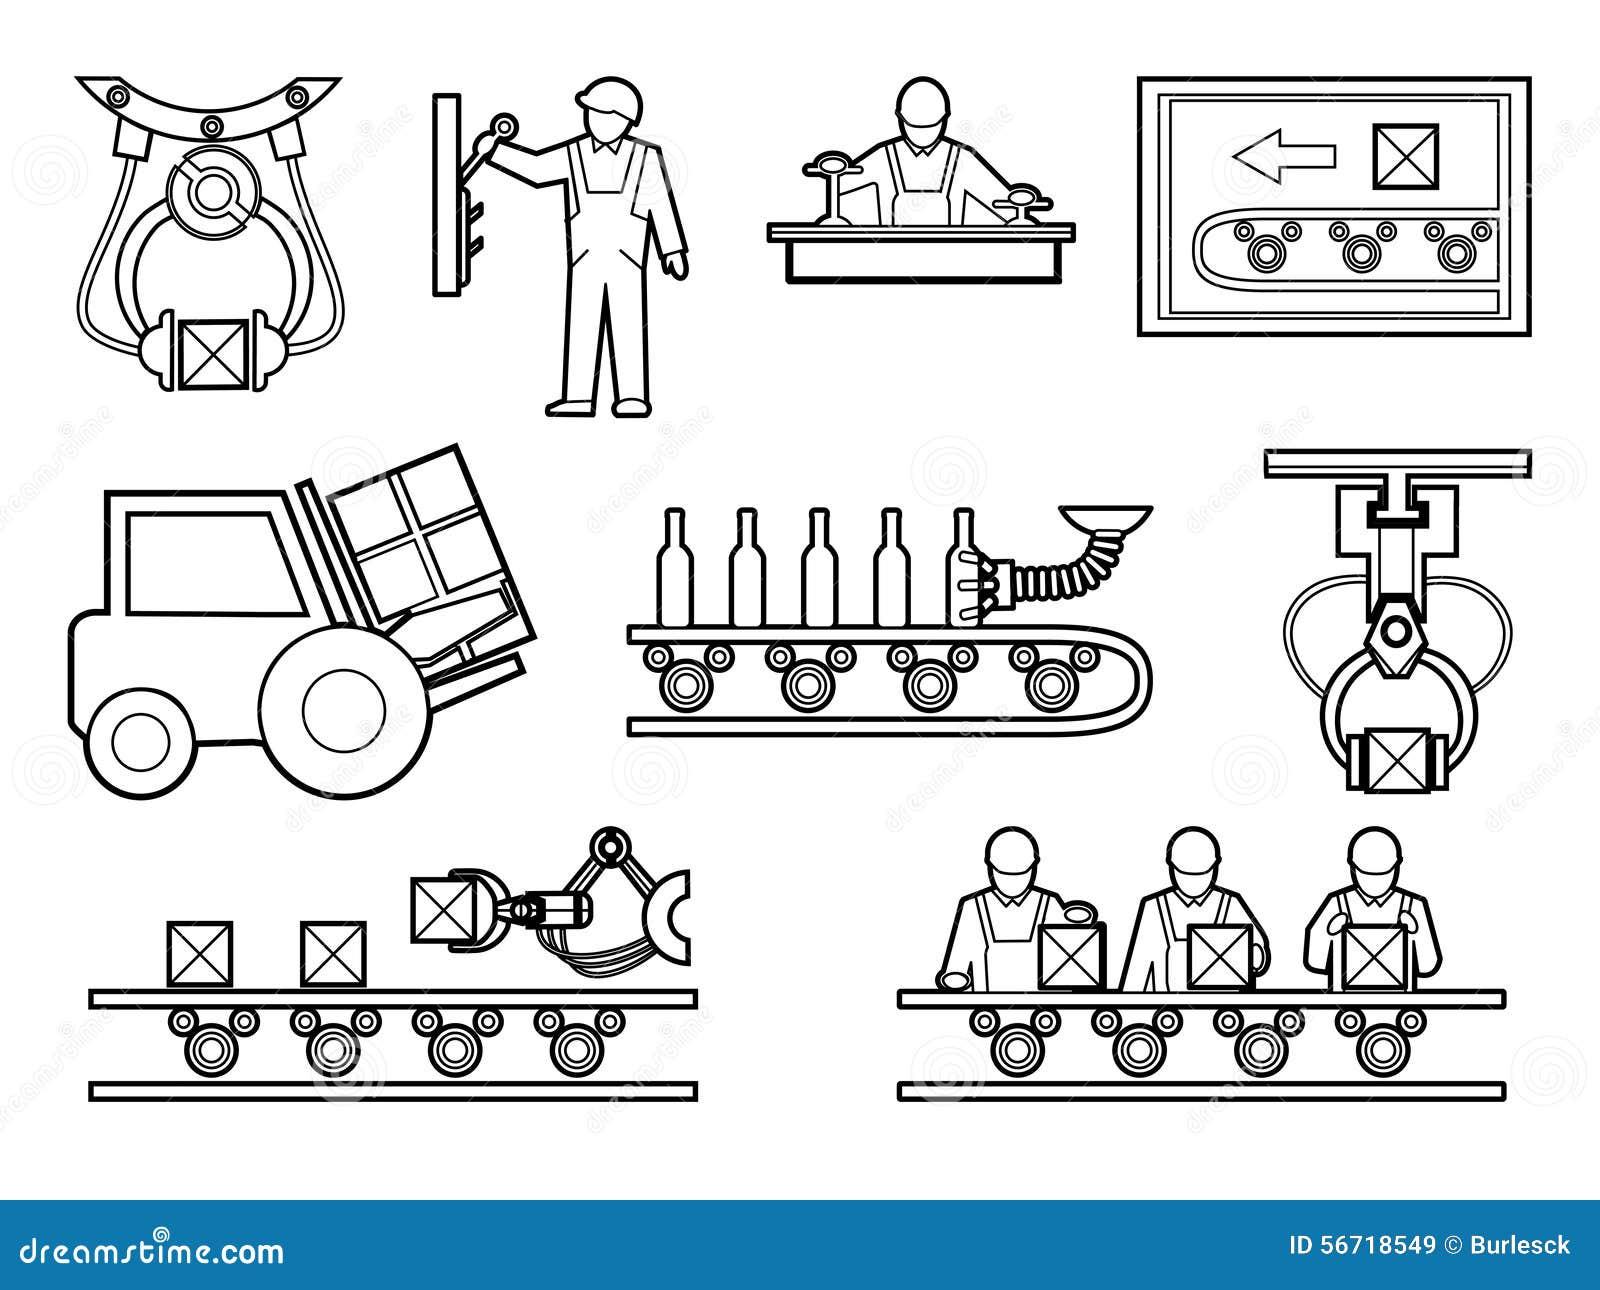 ic u00f4nes industriel et de processus de fabrication r u00e9gl u00e9es dedans illustration de vecteur